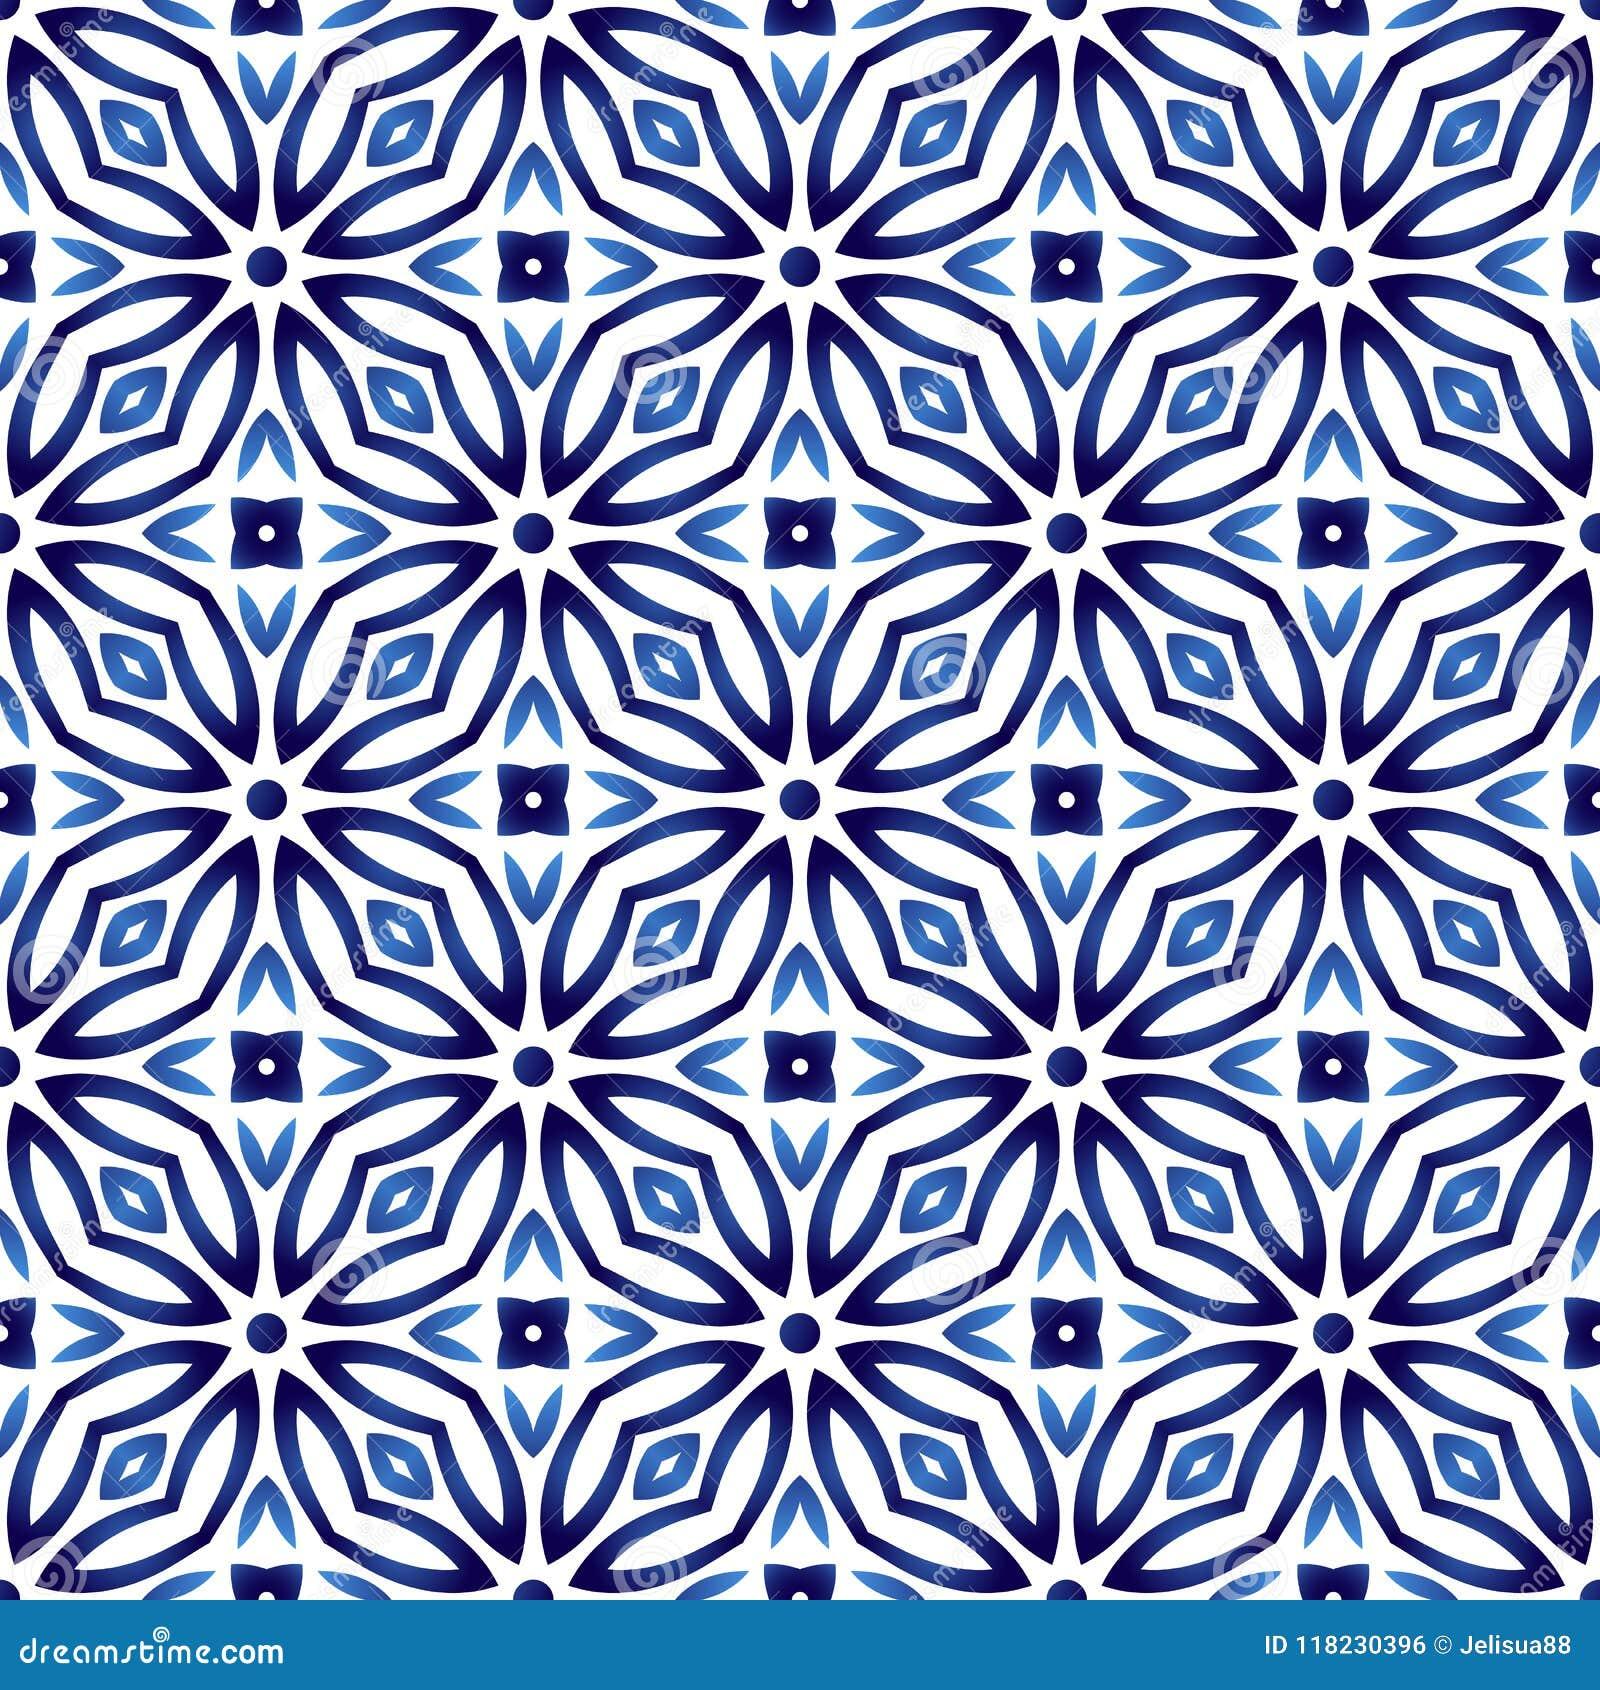 Ceramic tile pattern. Islamic, indian, arabic motifs. Damask sea